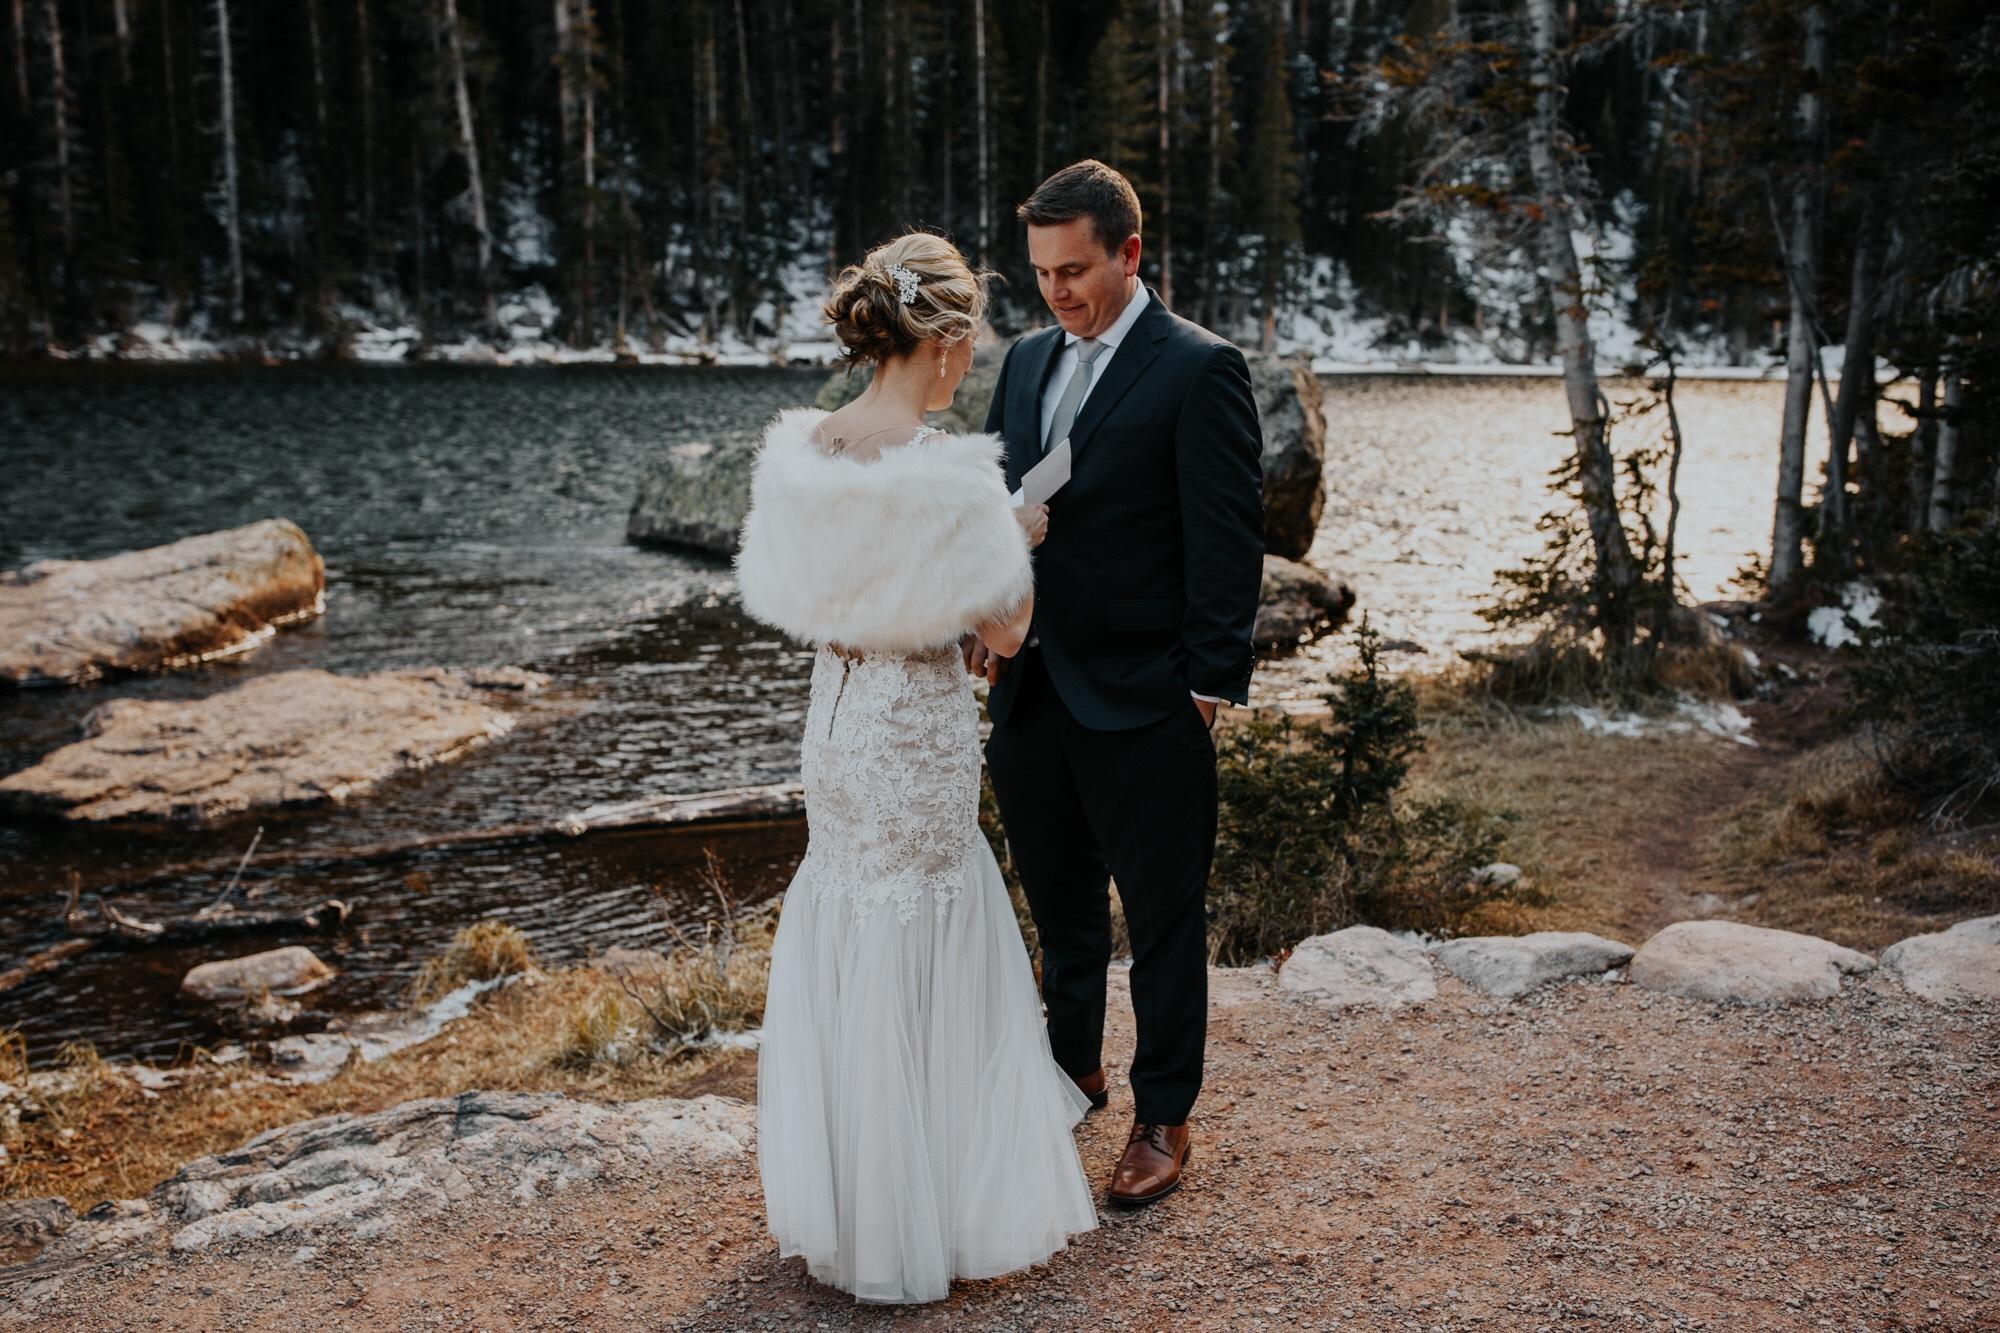 wedding-hairstylist-Denver-bridal-hair